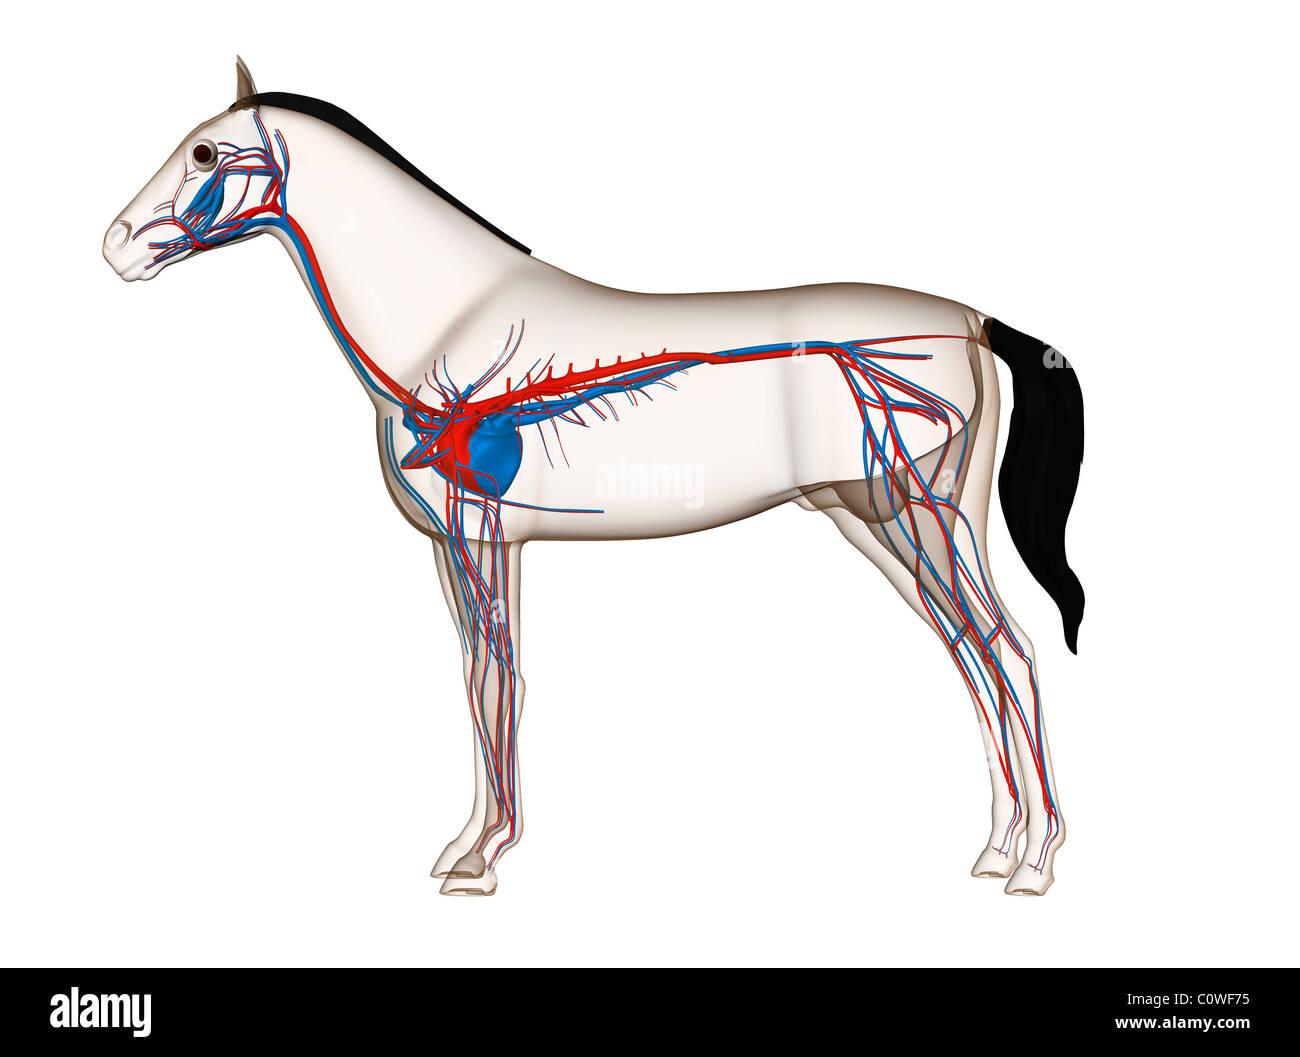 Horse Anatomy Heart Circulation Stock Photo 34981497 Alamy